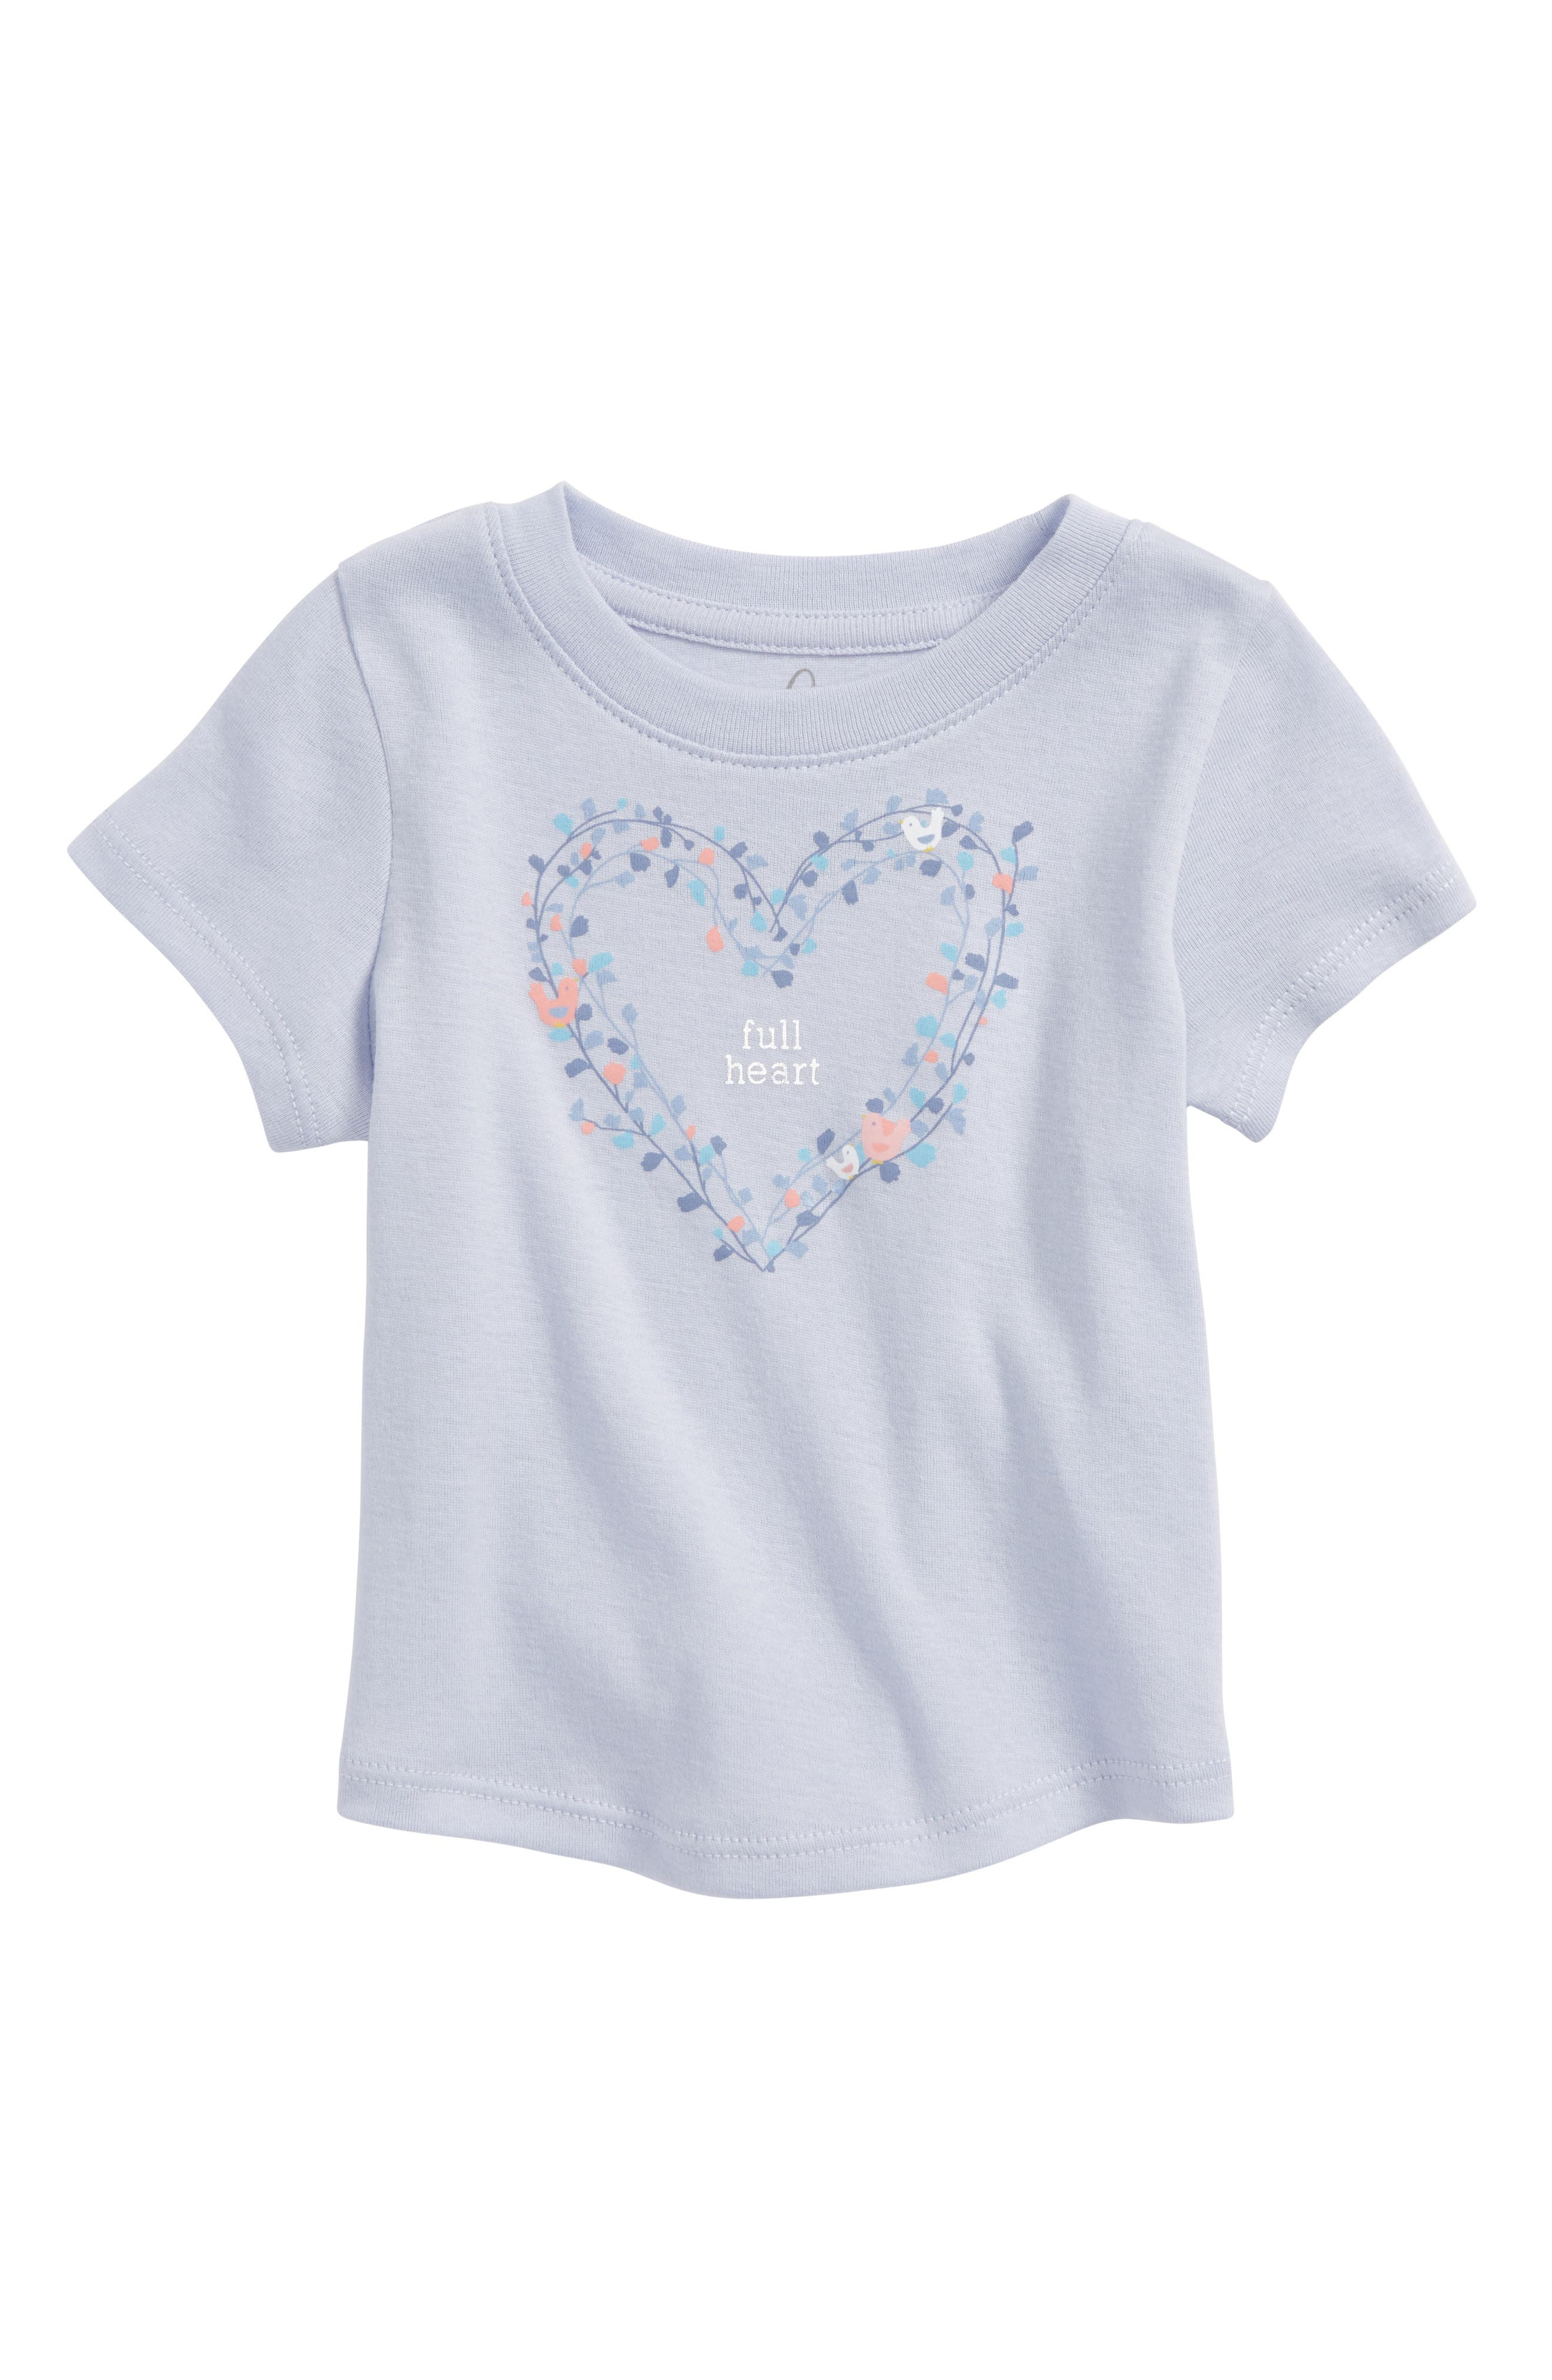 Alternate Image 1 Selected - Peek Full Heart Tee (Baby Girls)